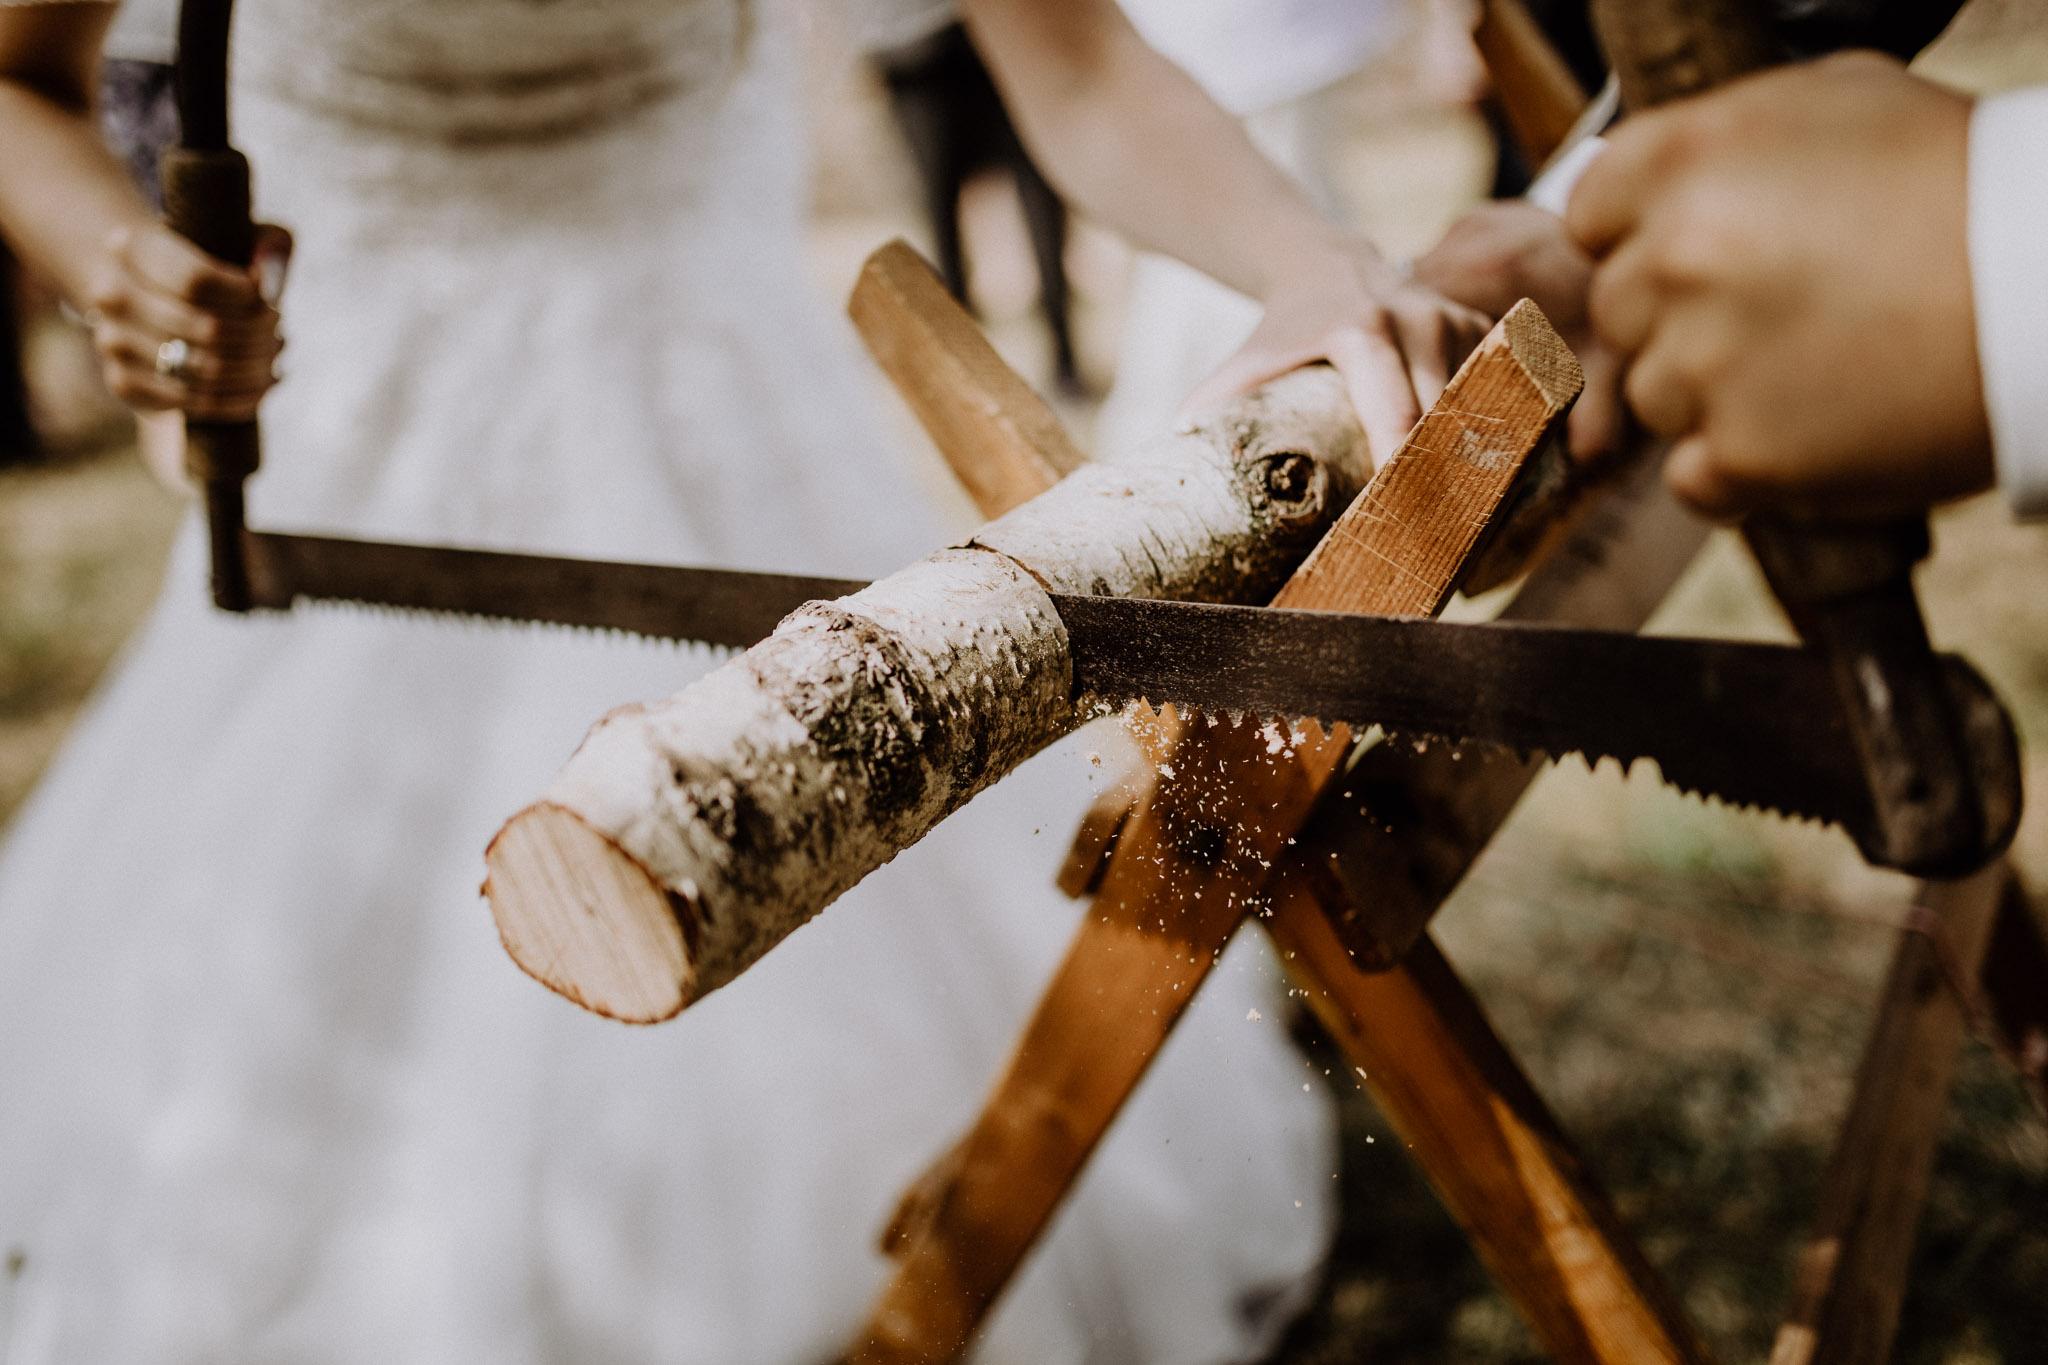 Hochzeit in Schmölln I Couple I Shooting I Wedding I Hochzeit IThüringen Hochzeitsfotografie I Wedding Photography